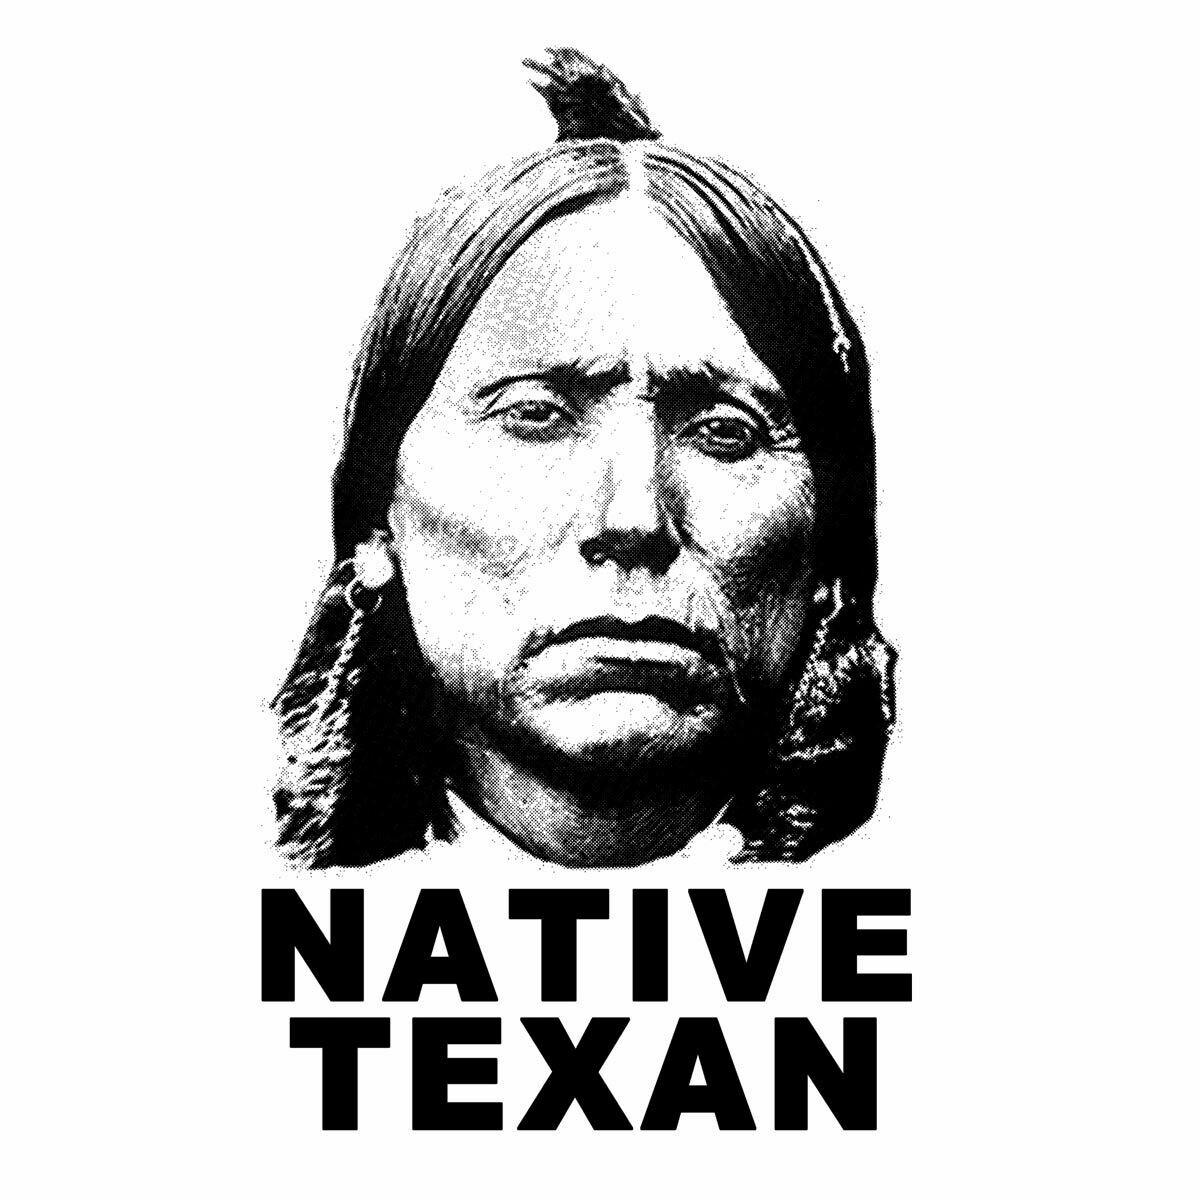 NATIVE TEXAN Quanah Parker shirt